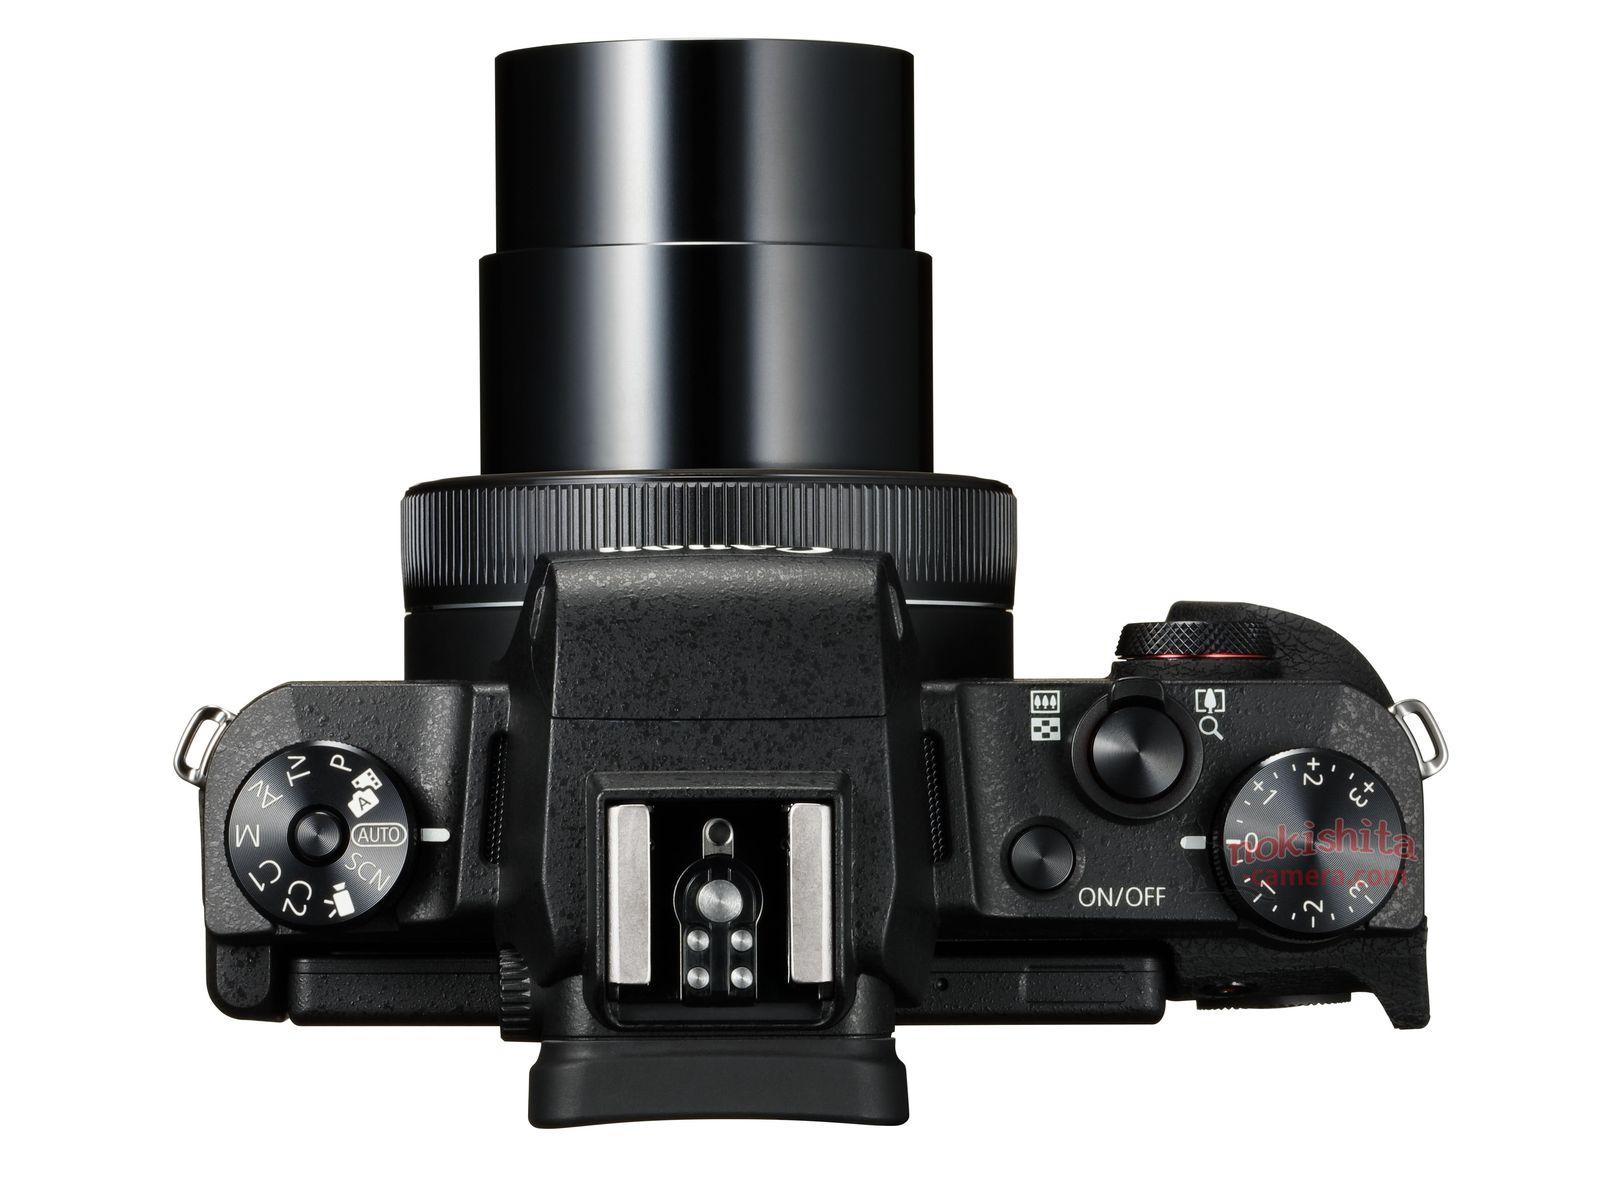 Canon PowerShot G1 X Mark III, вид сверху